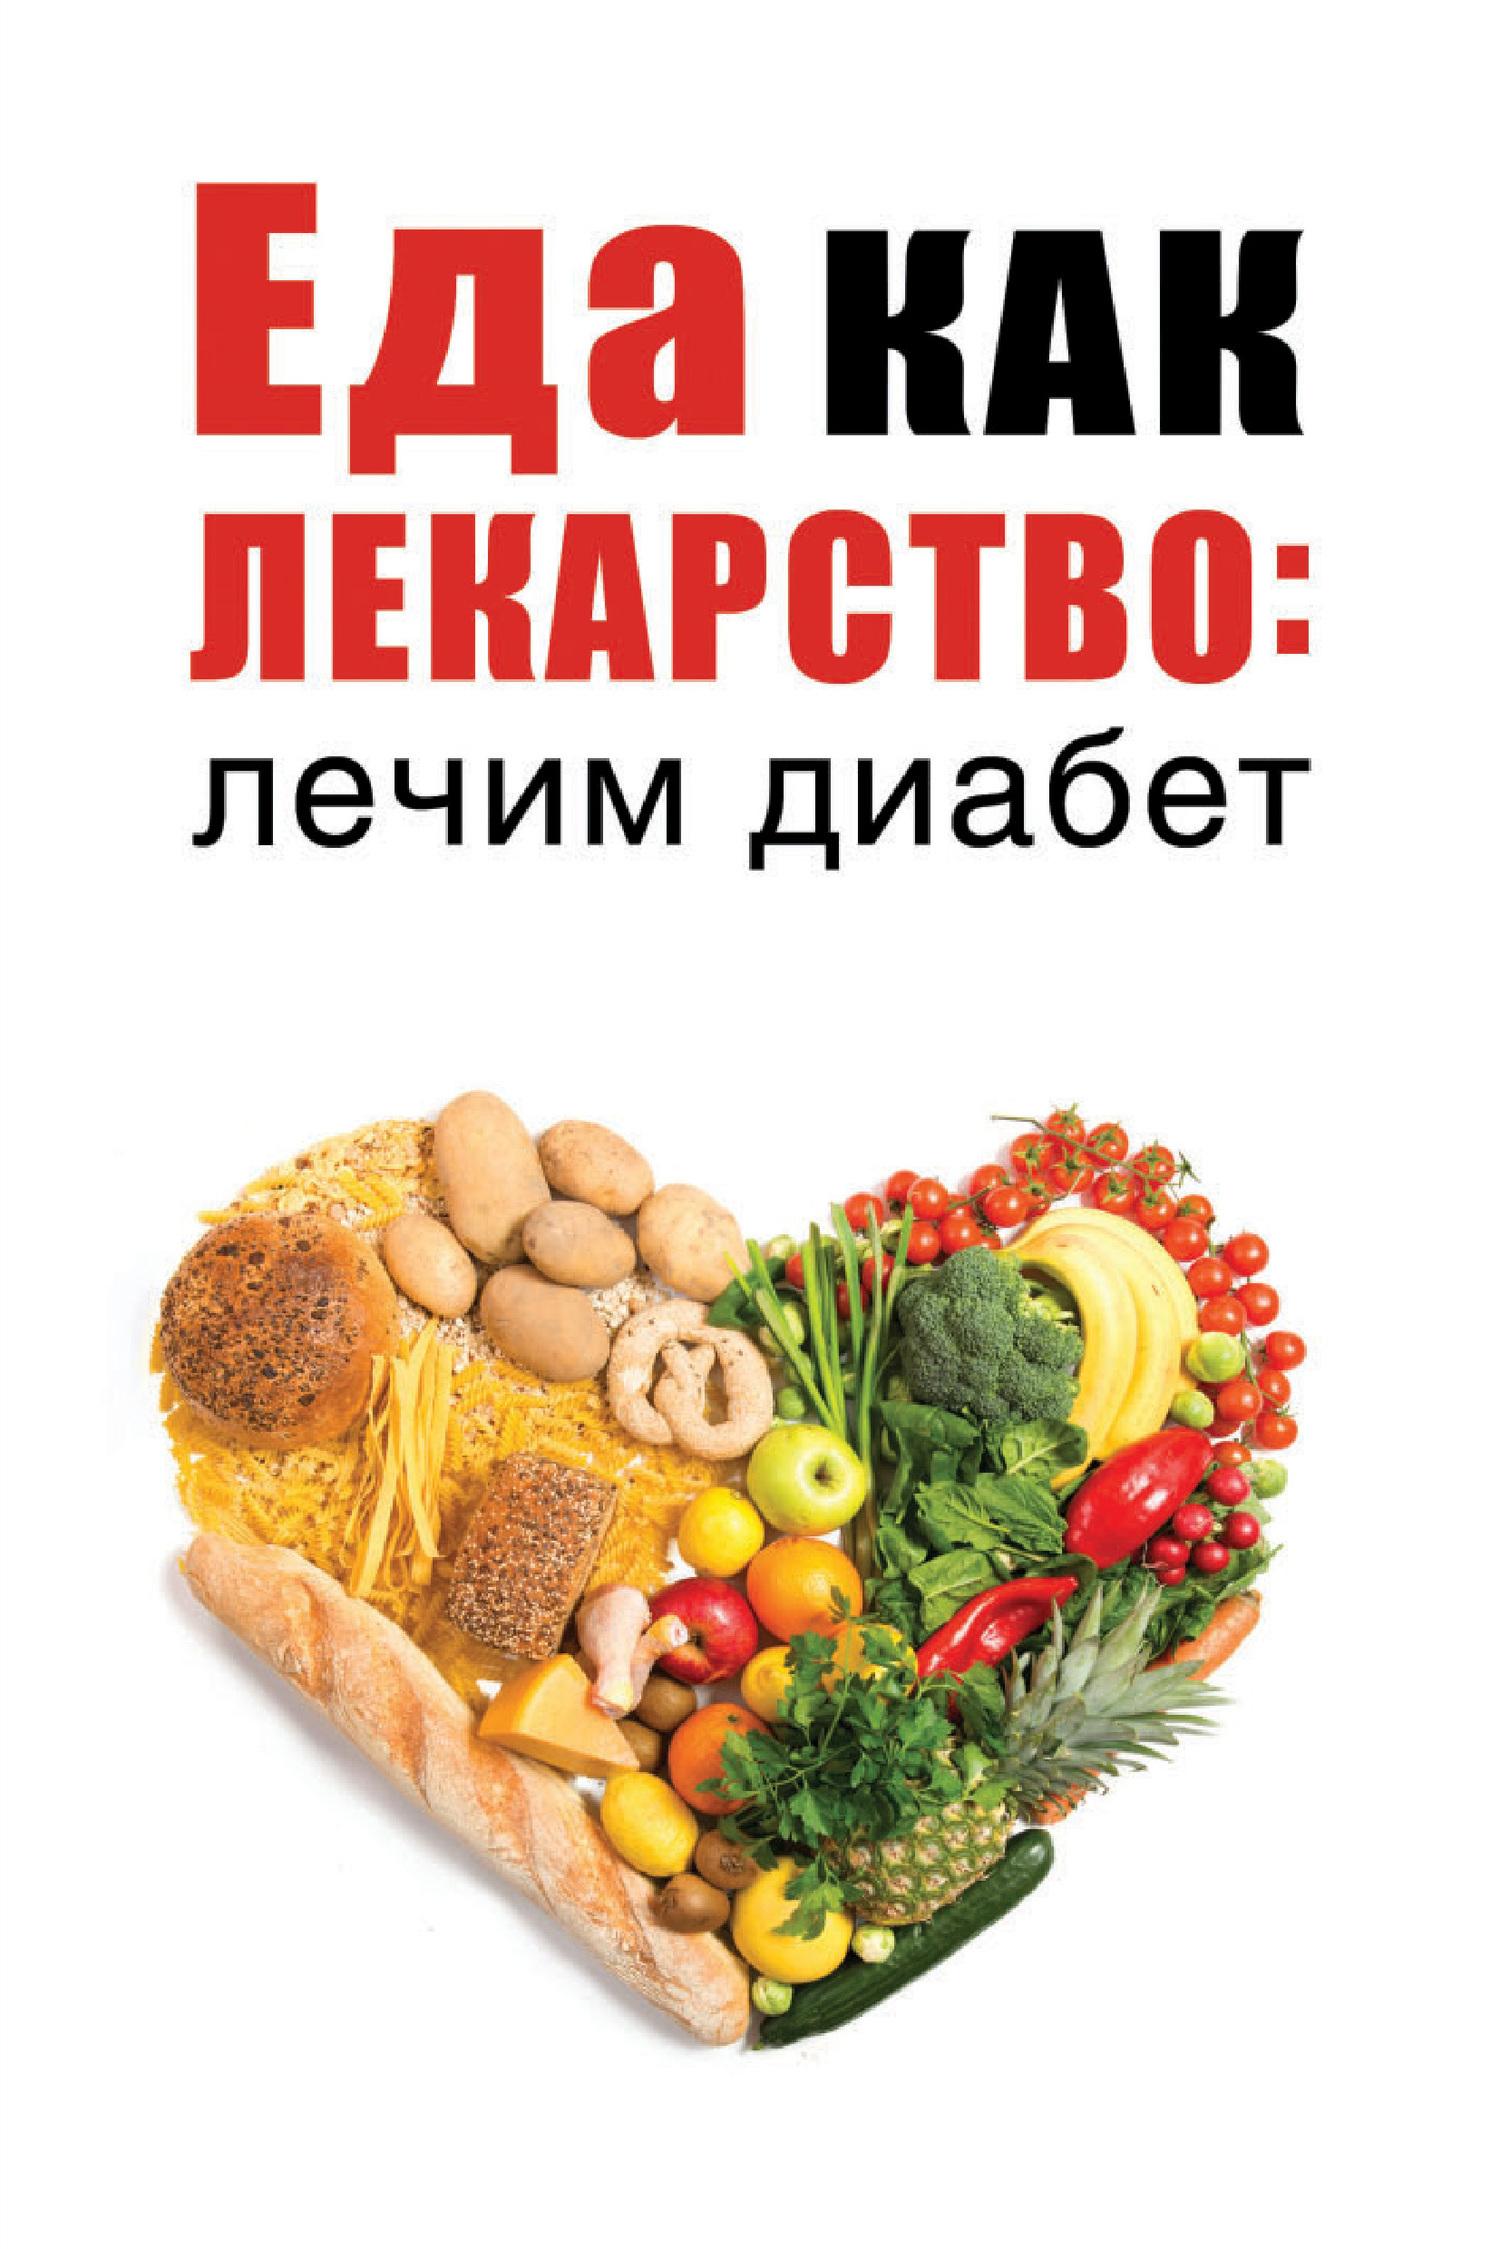 Еда как лекарство: лечим диабет